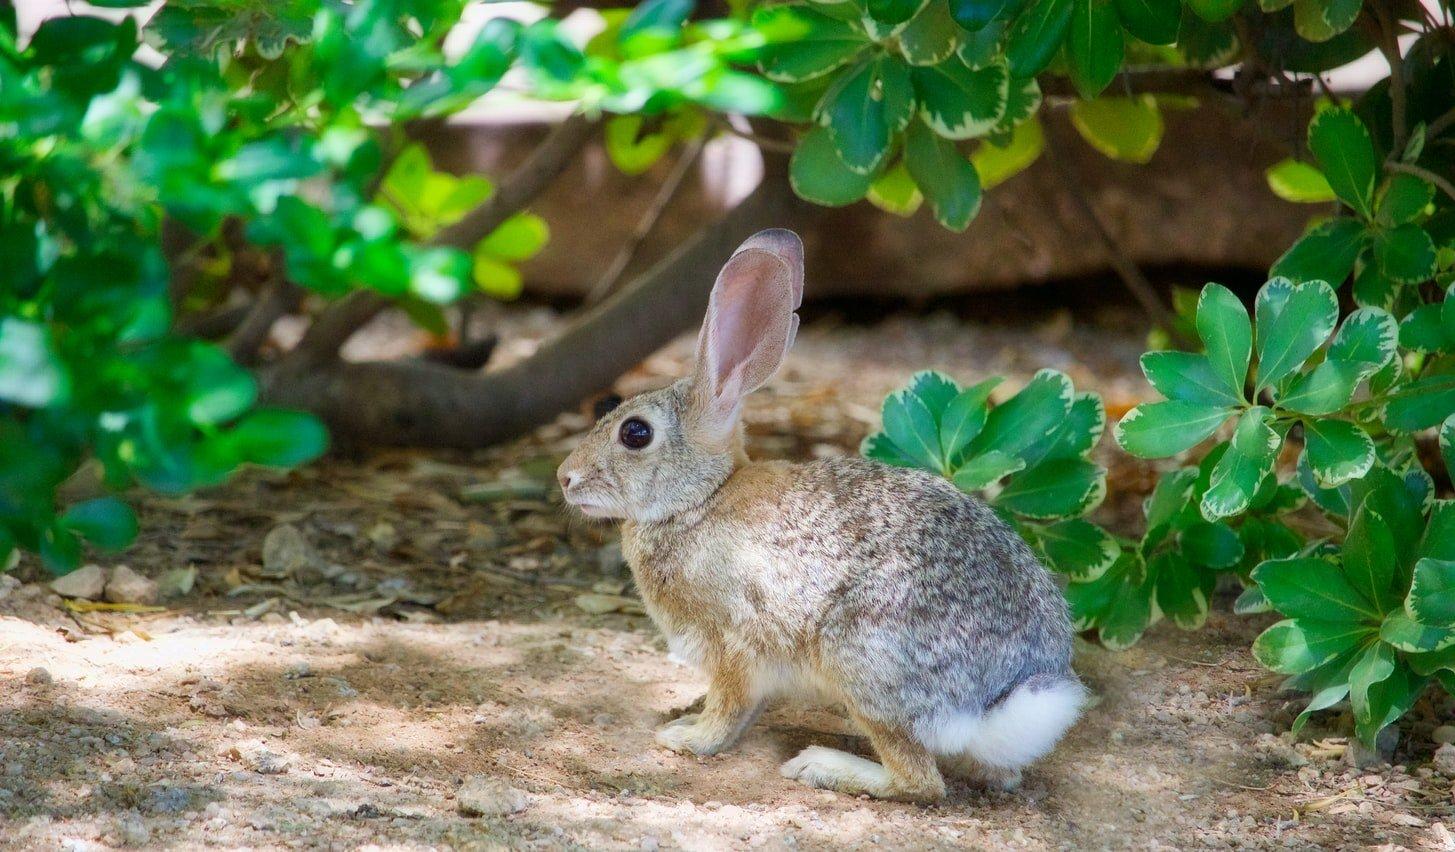 Do rabbits dream